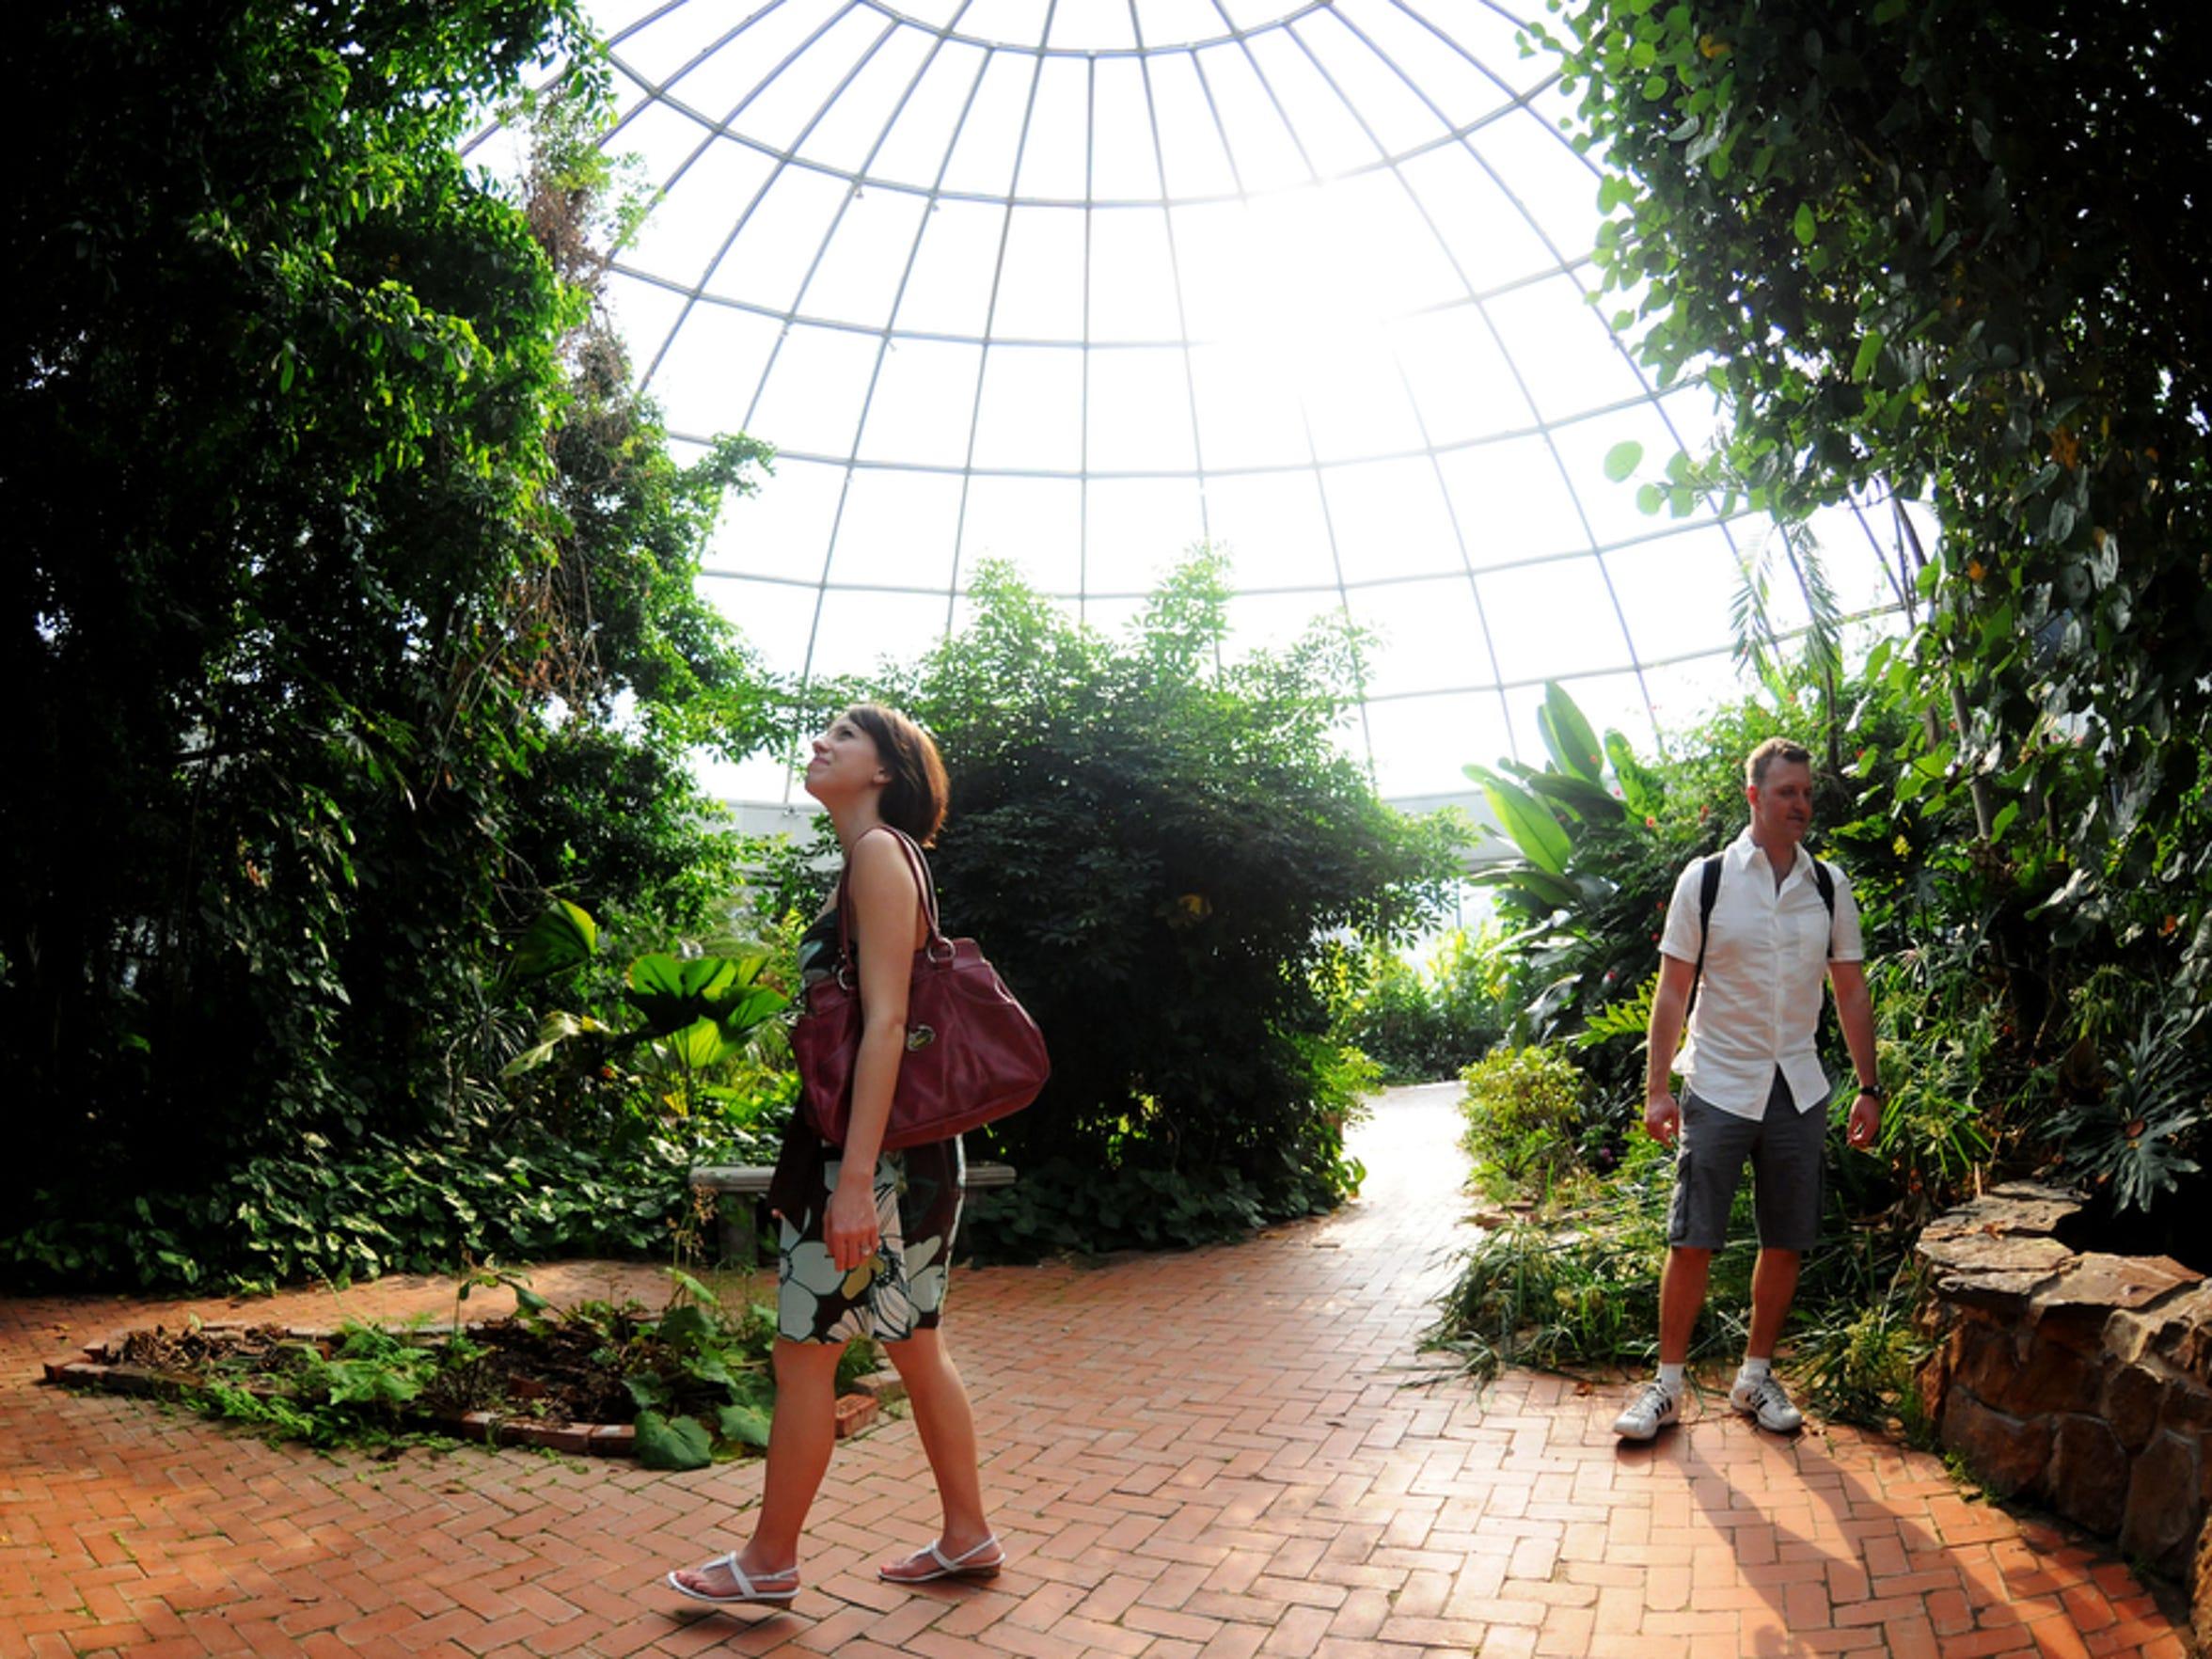 Aaron and Christina Tillman explore the Barnwell Center